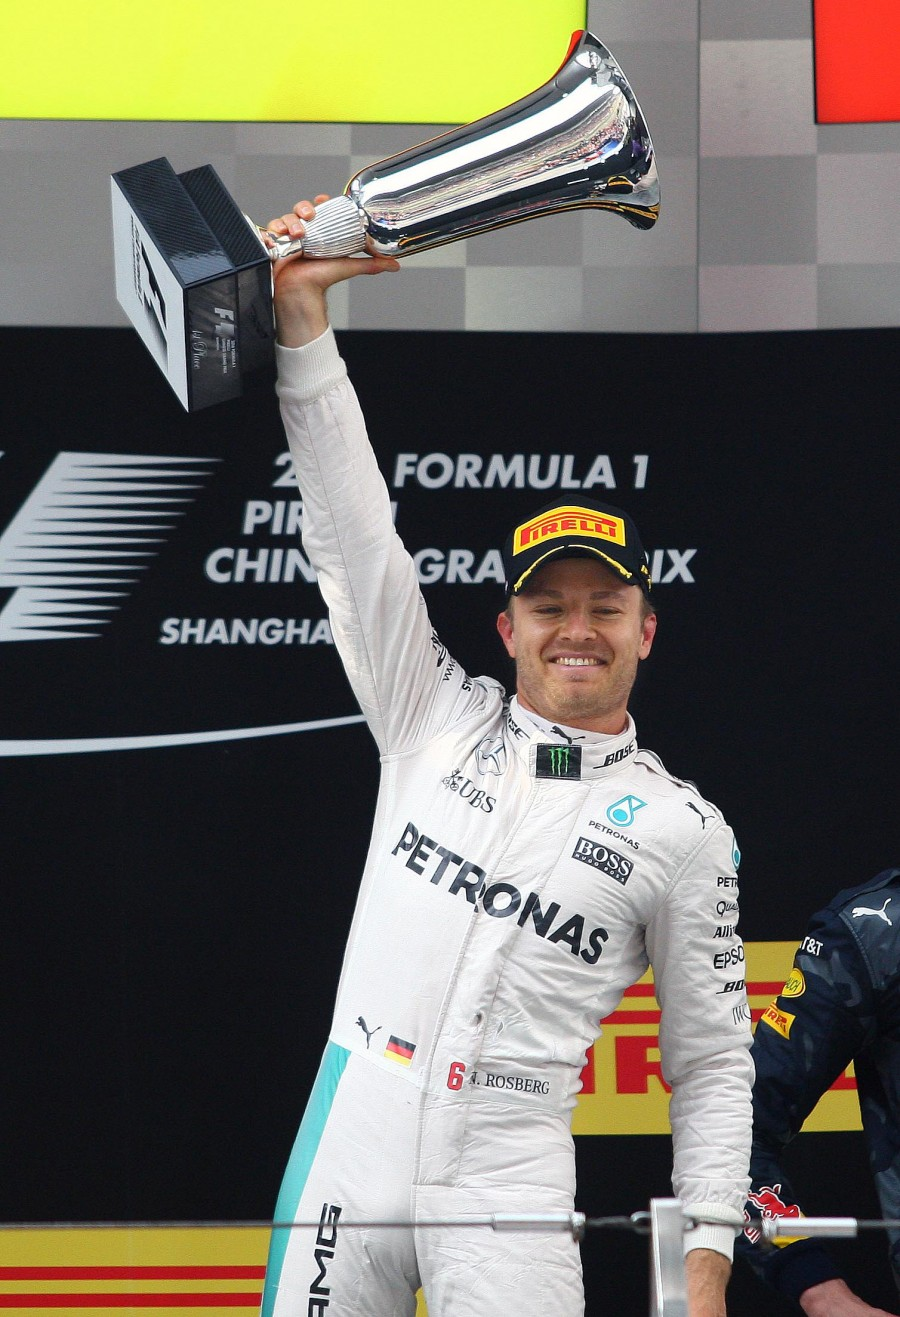 Nico Rosberg,Mercedes' racing driver Nico Rosberg,Mercedes driver Nico Rosberg,China Grand Prix,Nico Rosberg celebrates sixth F1 victory,F1 victory